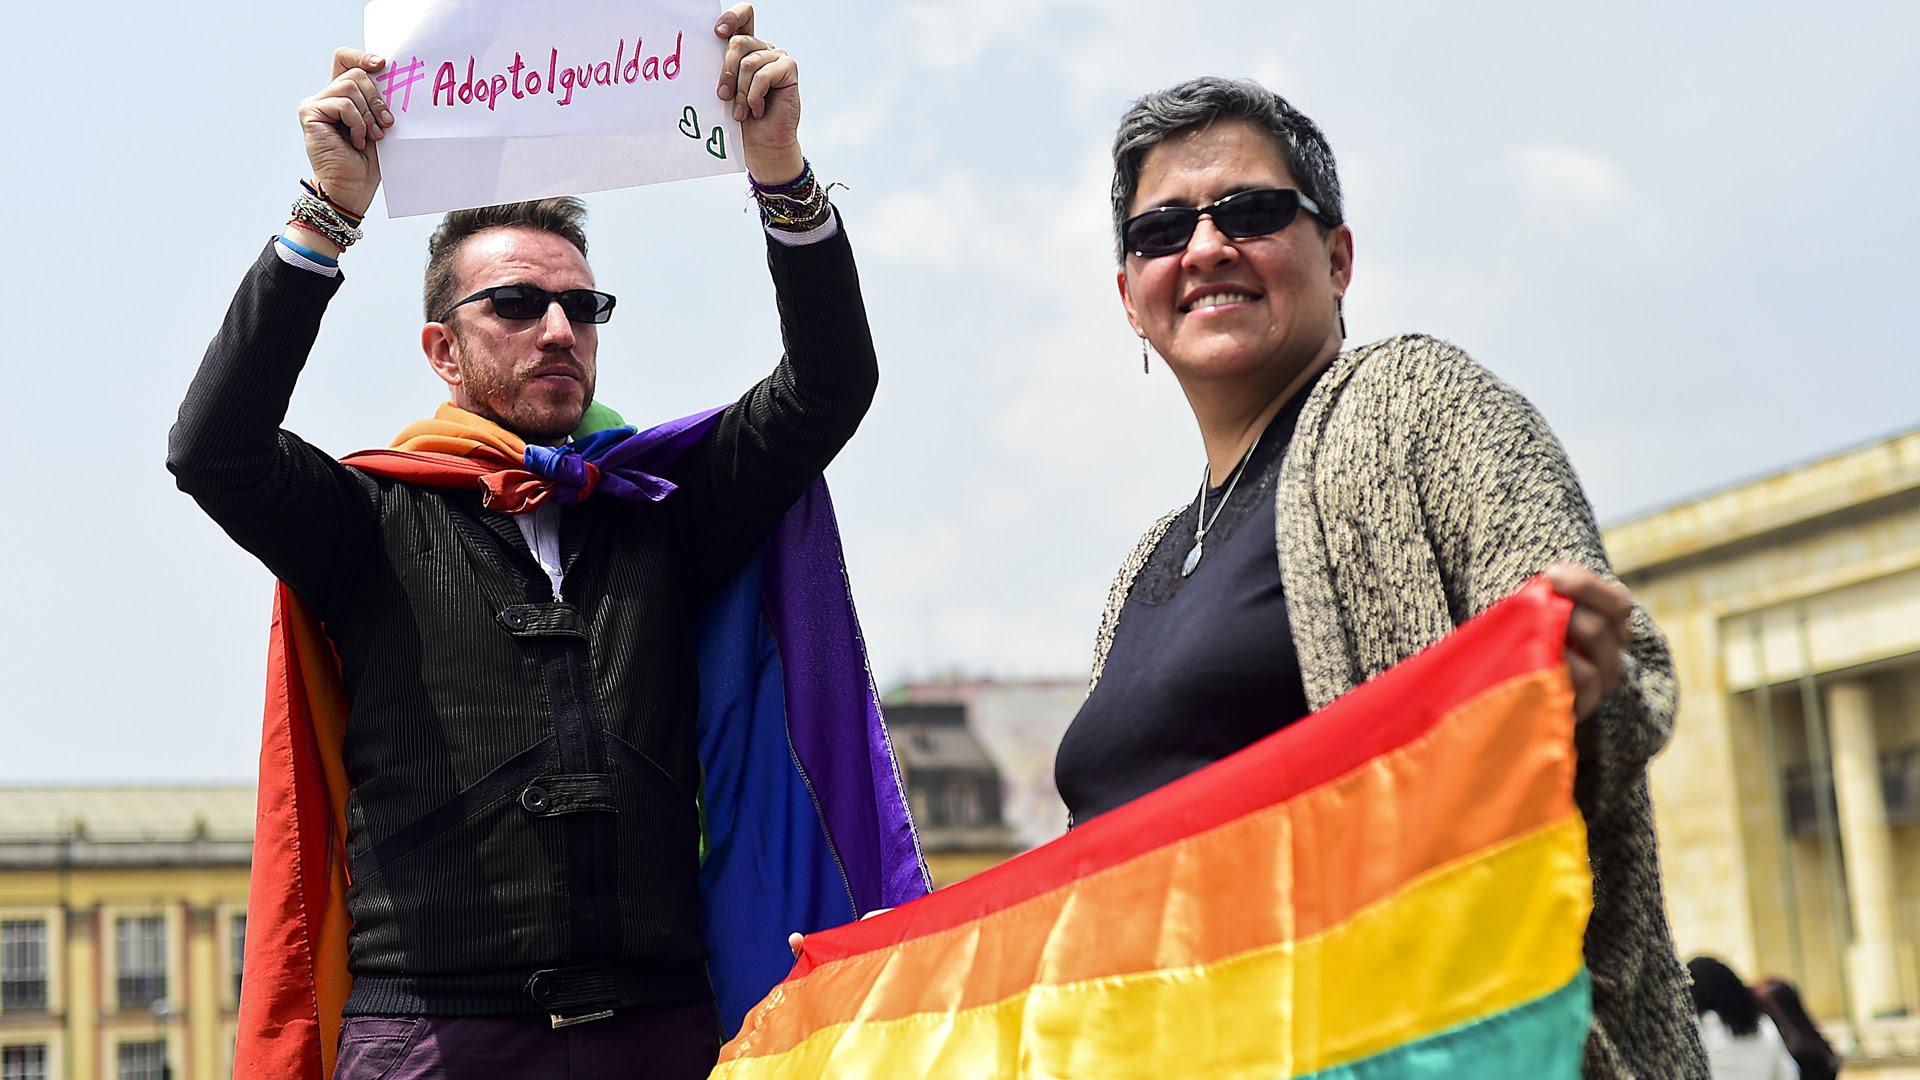 ricerca per le coppie gay in argentina